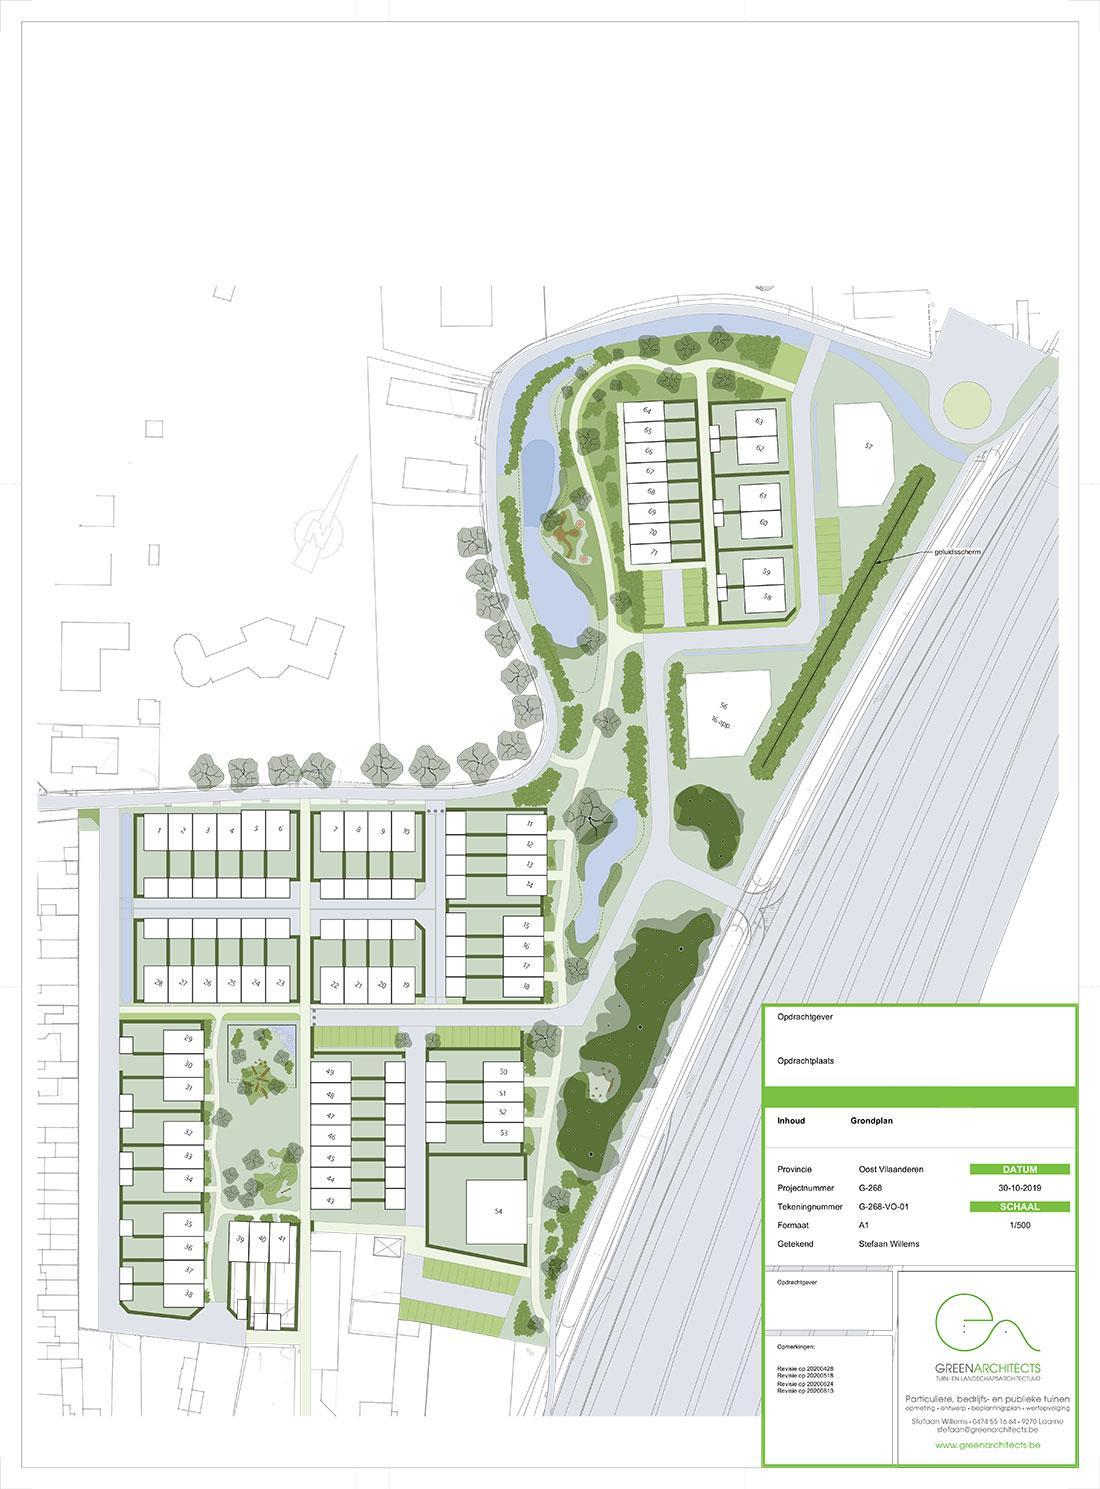 GREENARCHITECTS-TUINARCHITECT-STEFAAN-WILLEMS-omgevingsaanleg-verkaveling-menen-presentatieplan.jpg